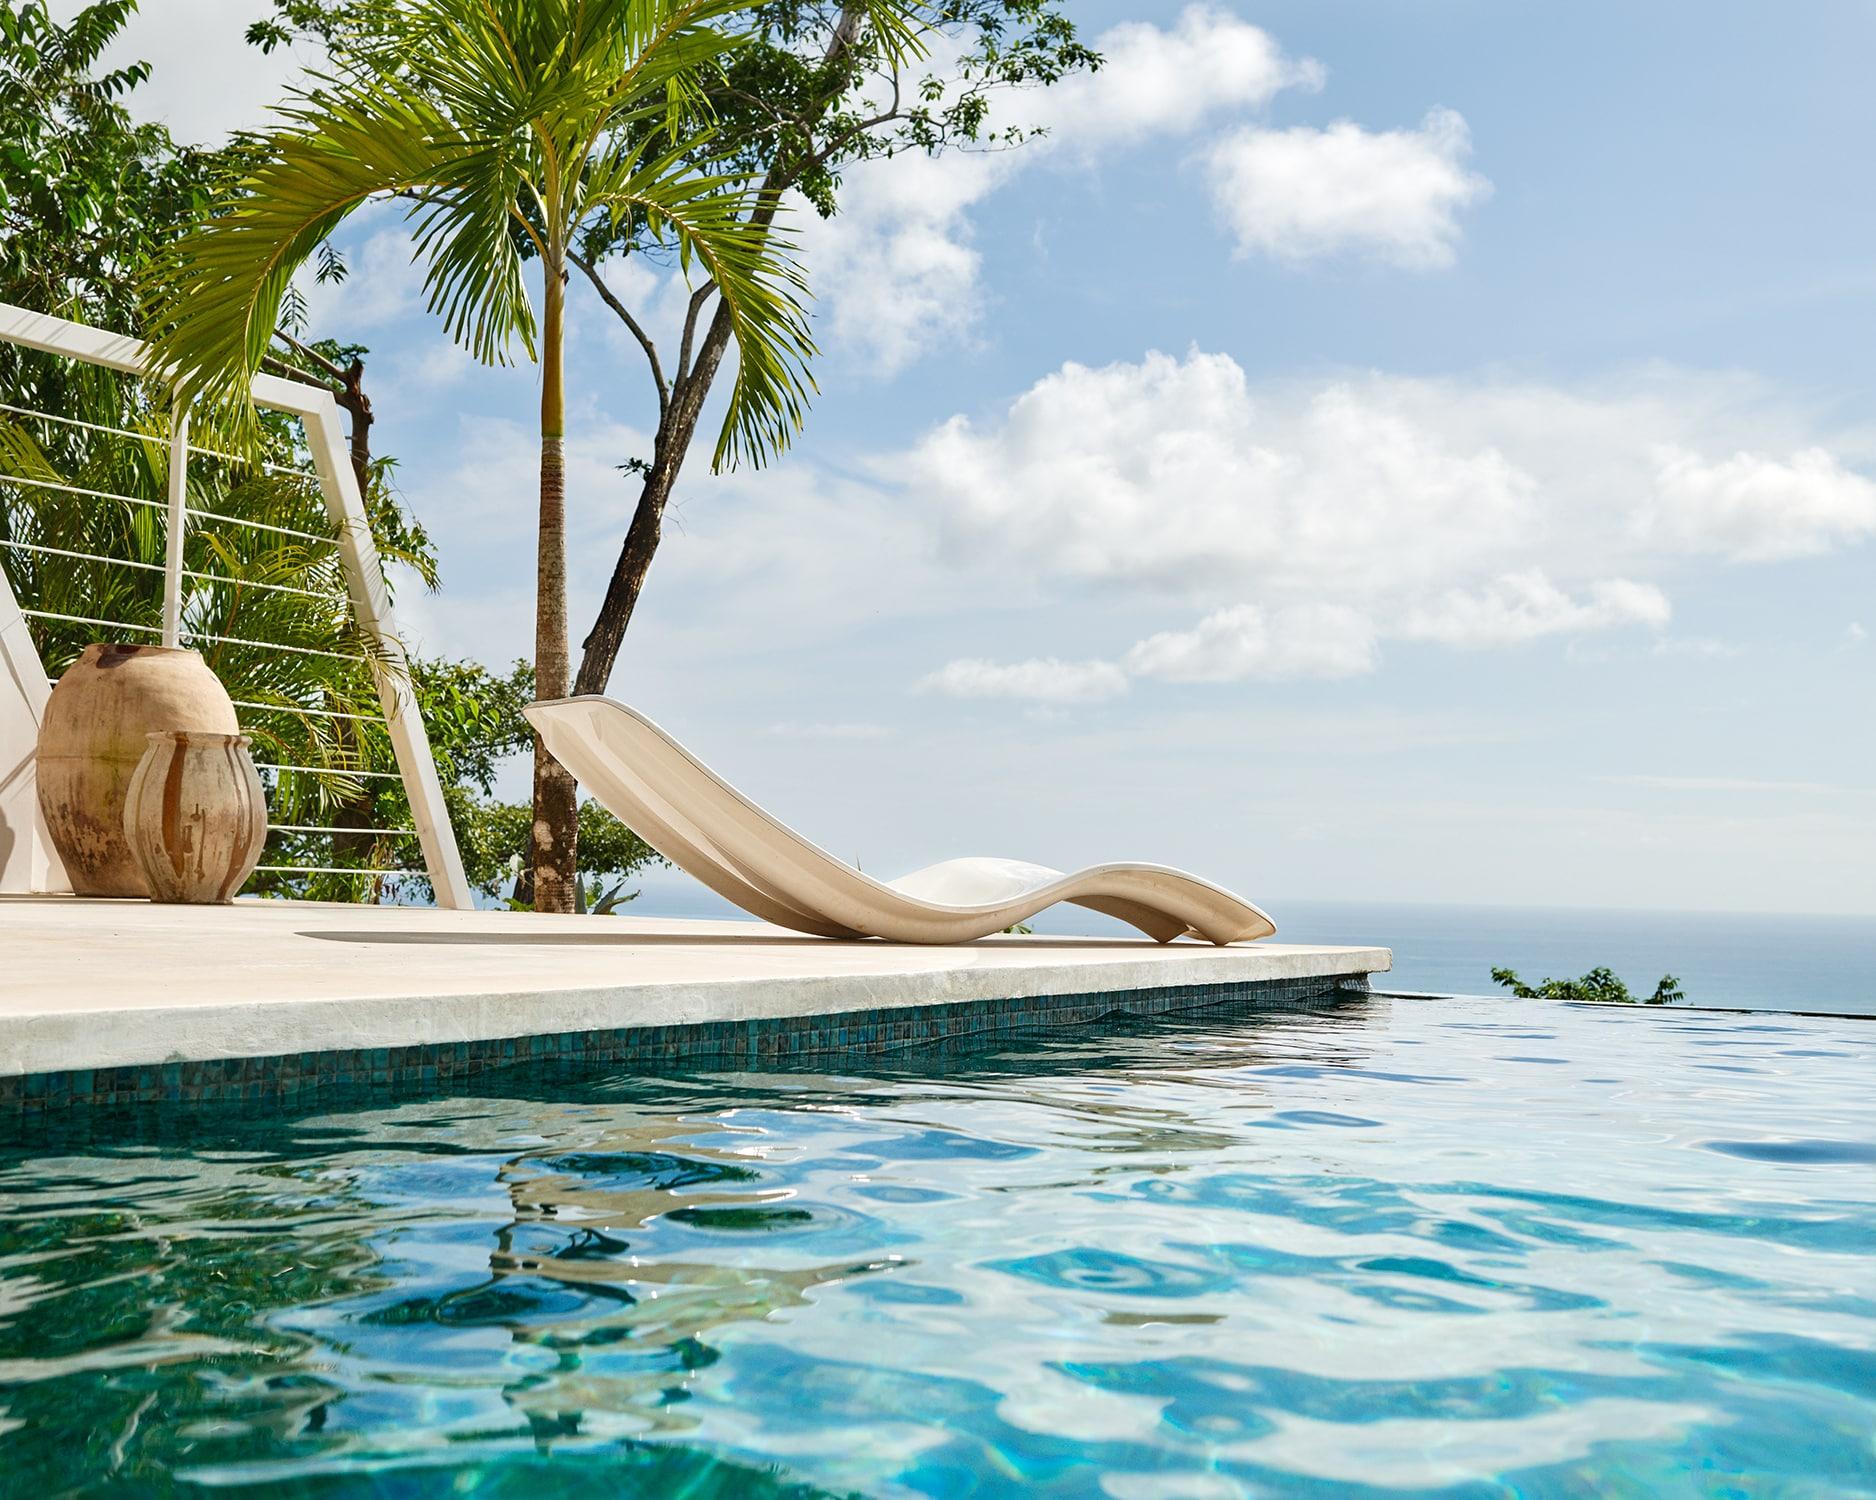 Exclusivity! Tastefull Ocean view Tropical Home in Santa Teresa